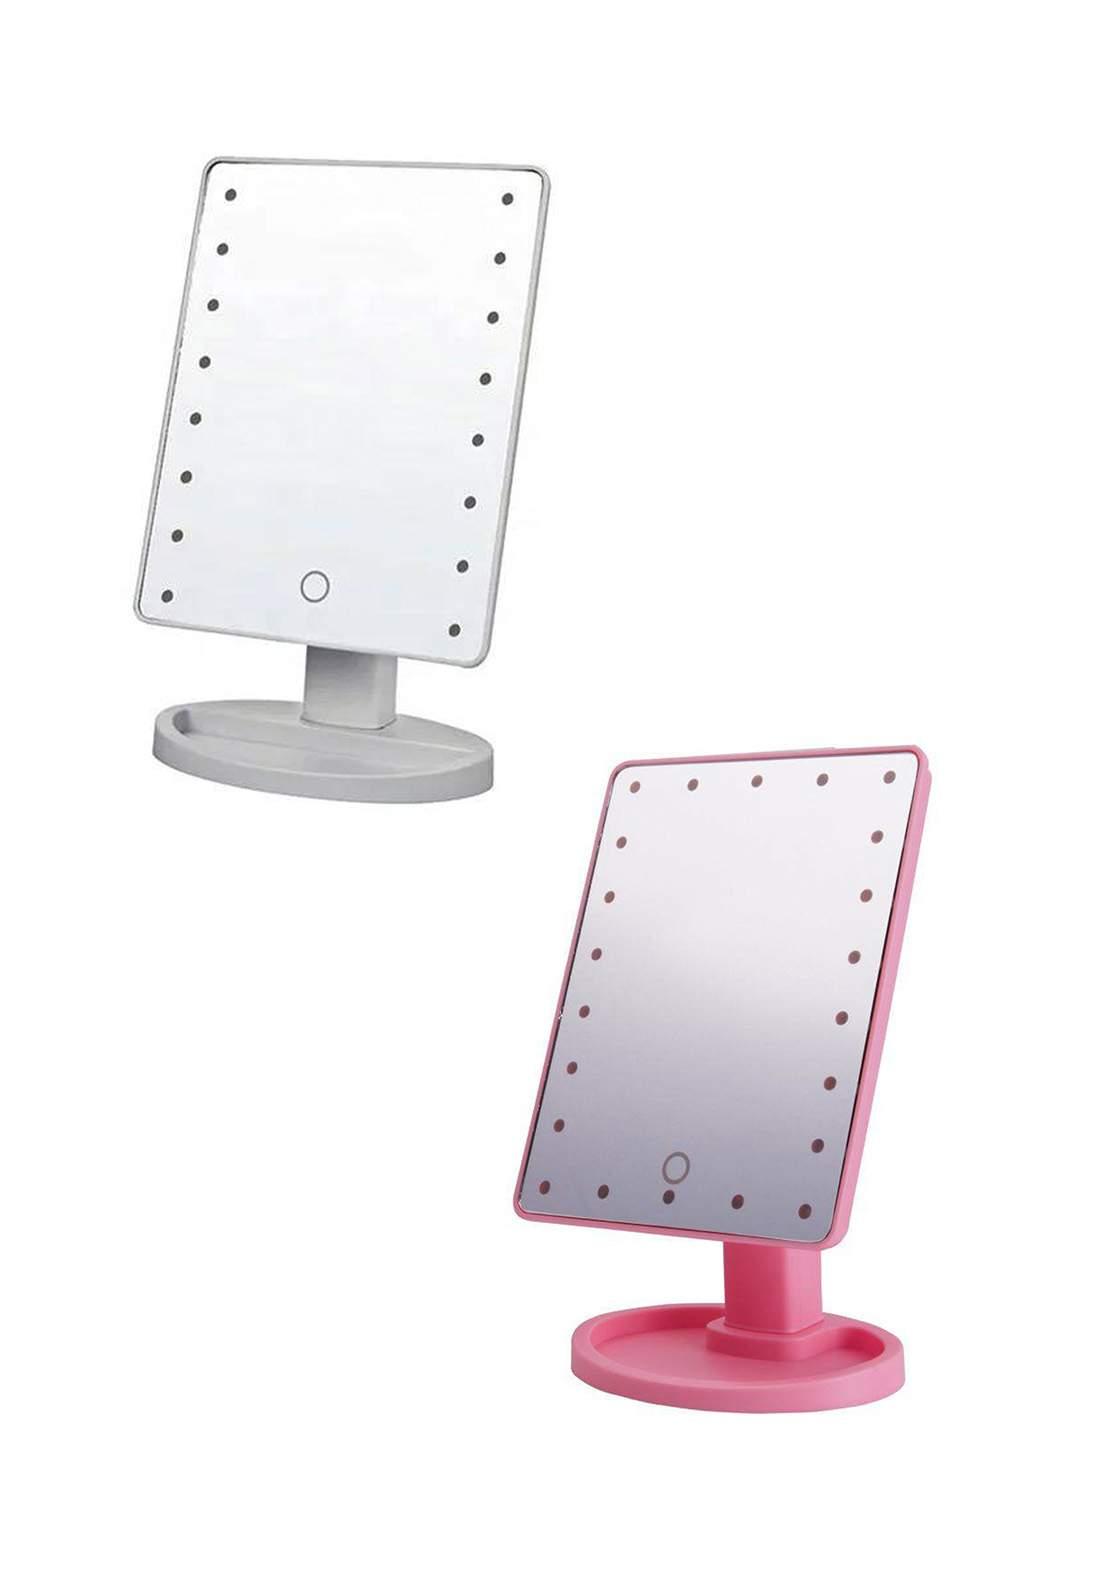 Large Led Mirror مرآة قابلة للدوران مع انارة ضوئية